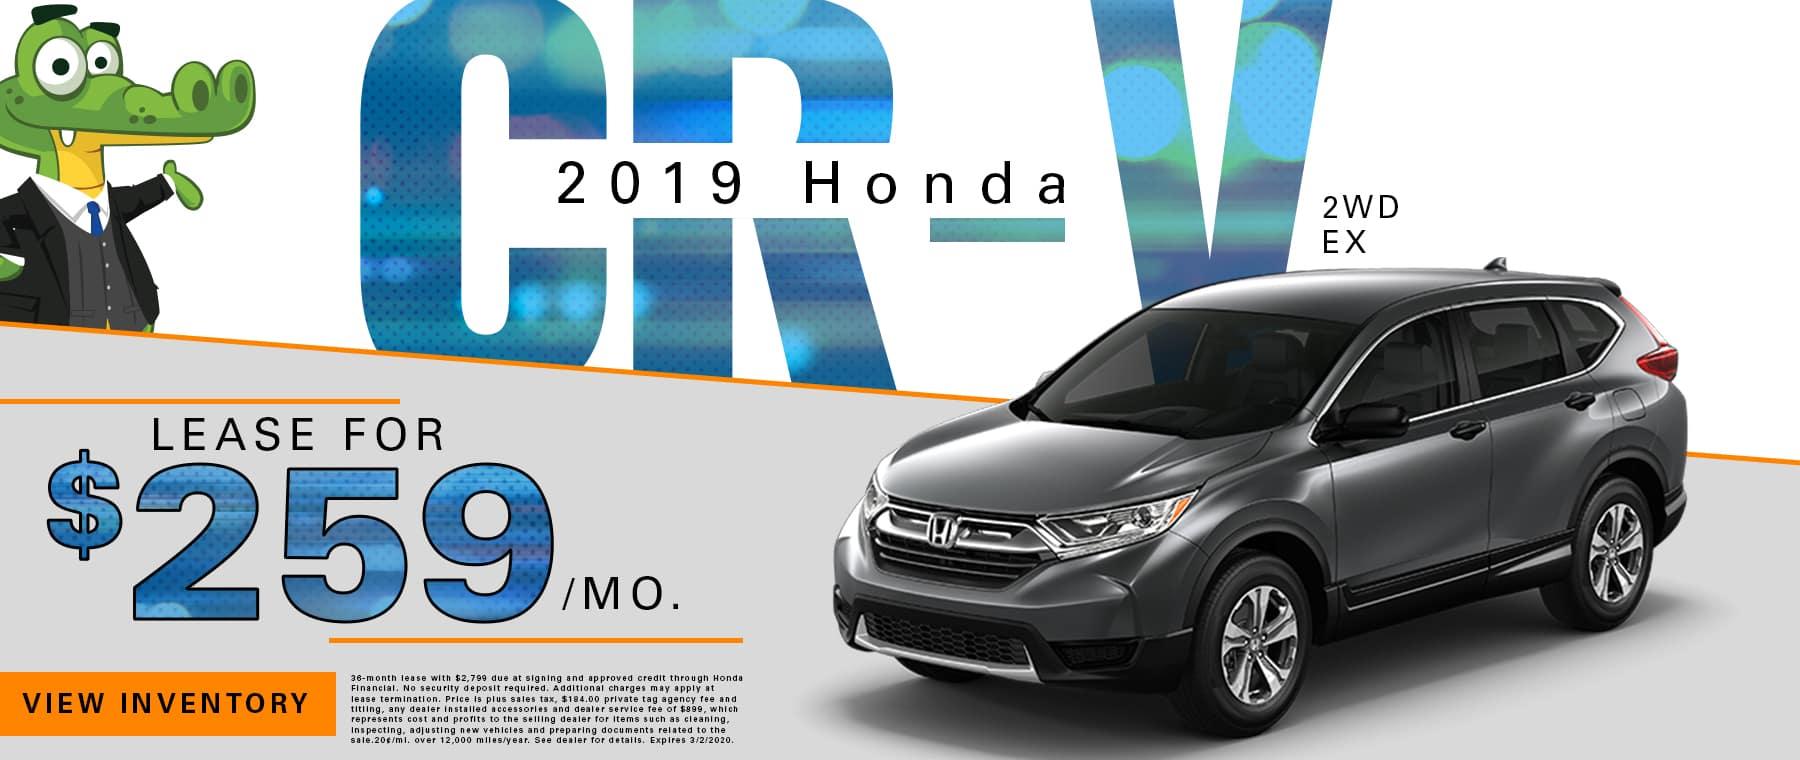 New 2019 Honda CR-V 2WD EX | Lease For $259/Mo